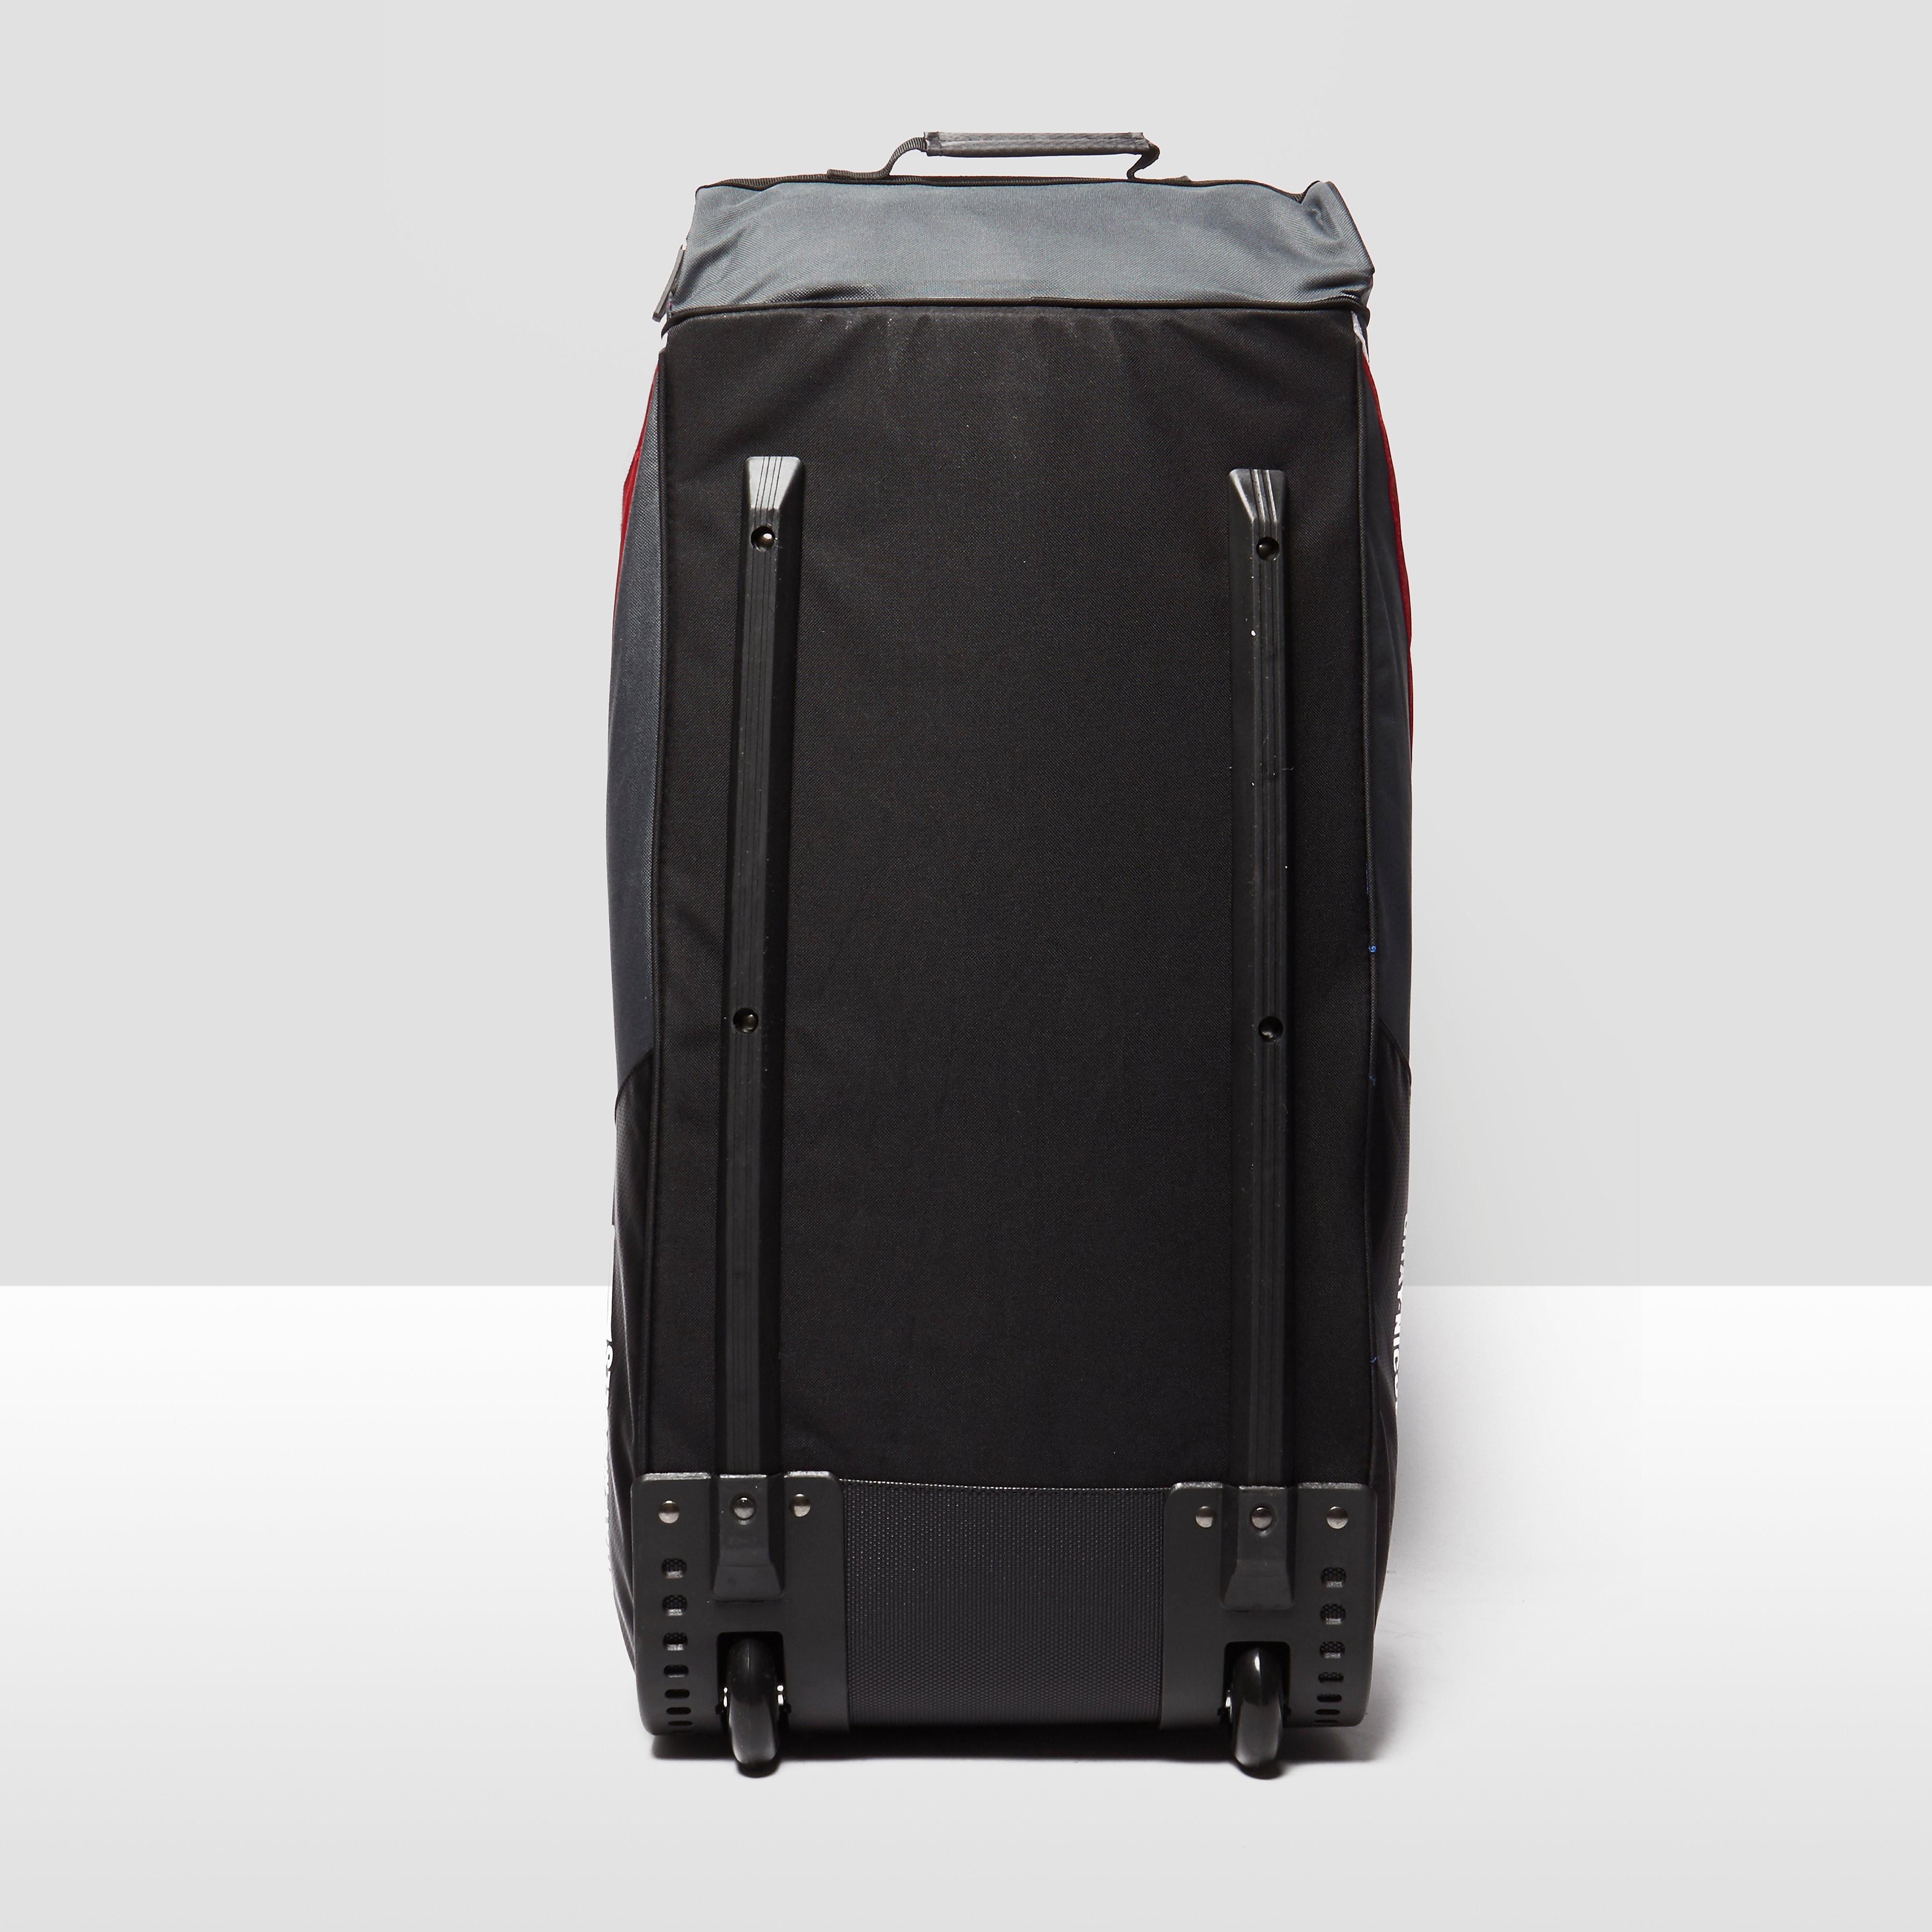 Gray Nicolls Predator 3 300 Cricket Luggage Bag